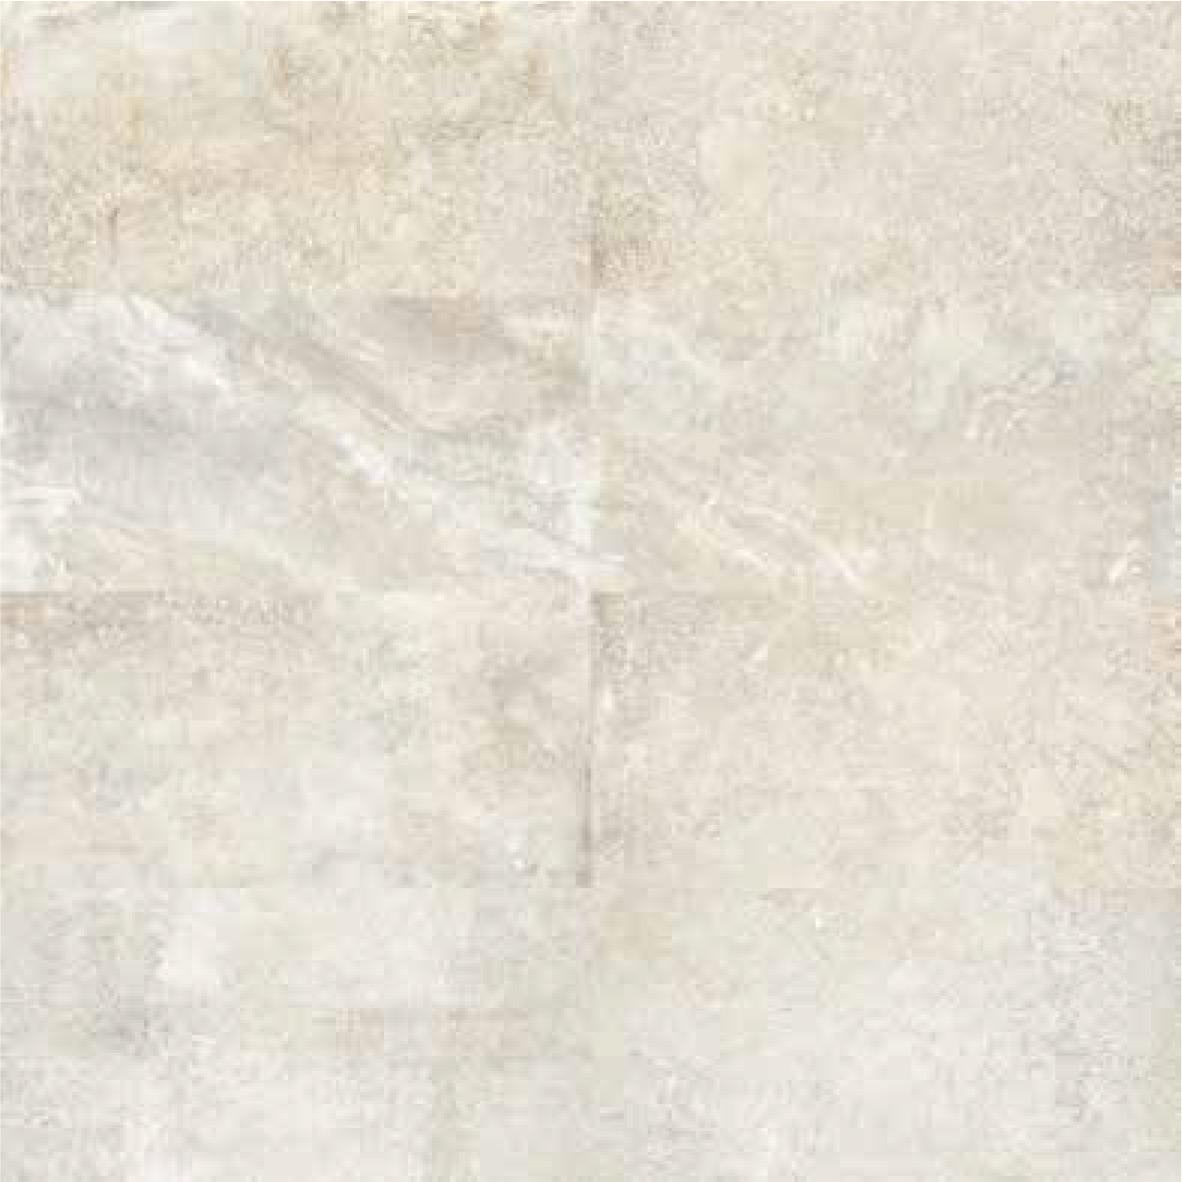 Castelvetro Always Bianco CAW80R1 Boden-/Wandfliese 80x80 Matt